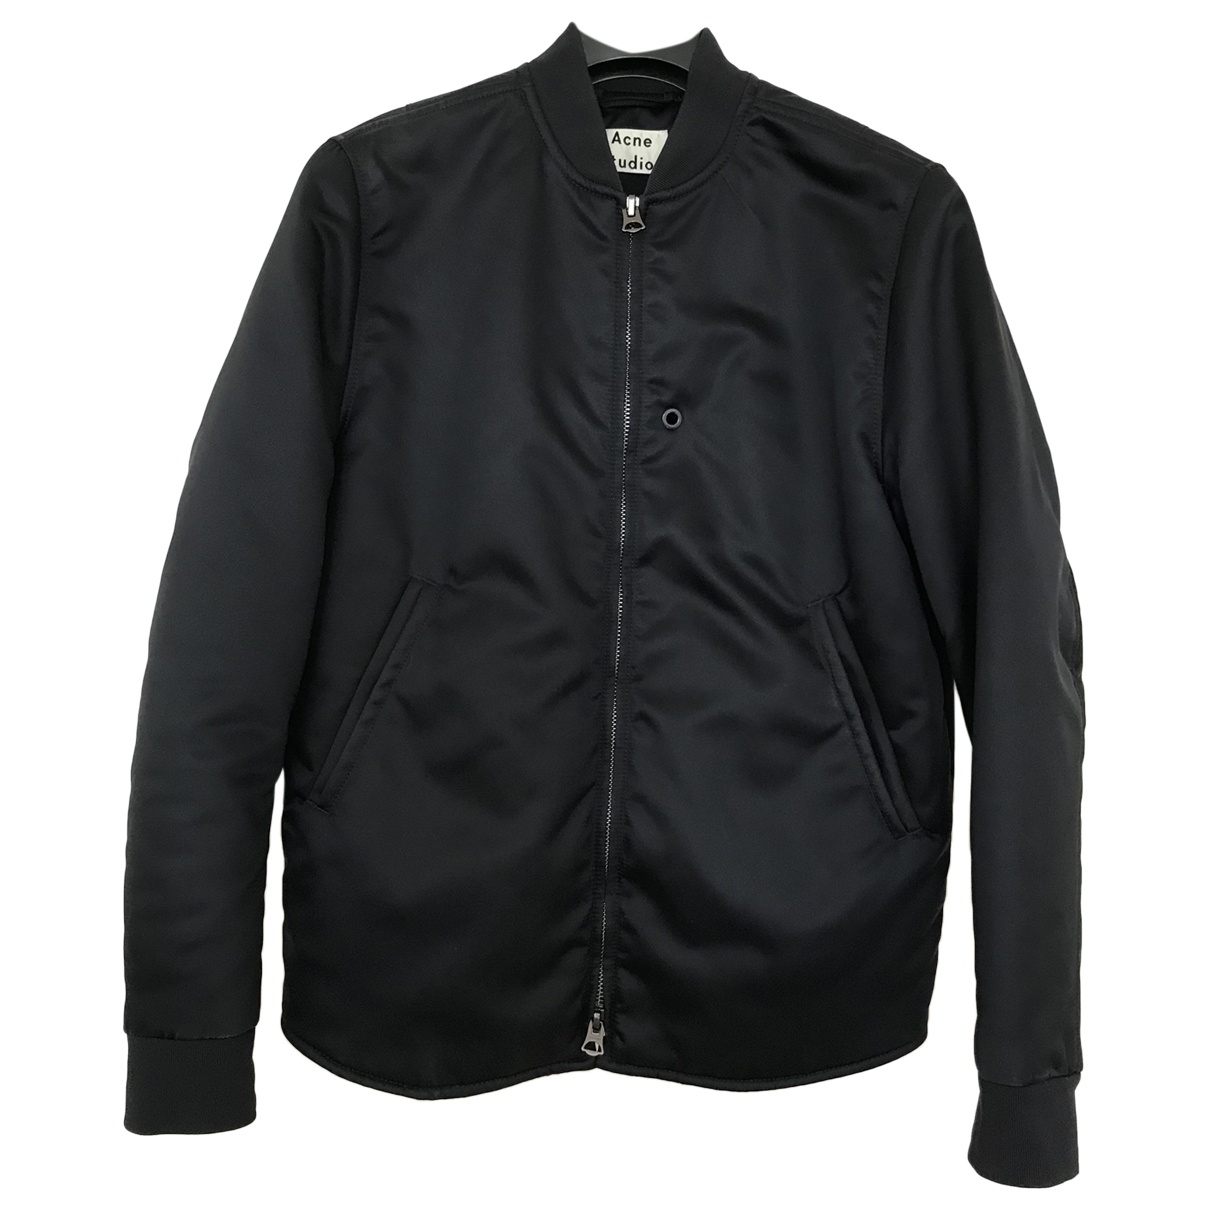 Acne Studios \N Navy jacket  for Men 38 UK - US